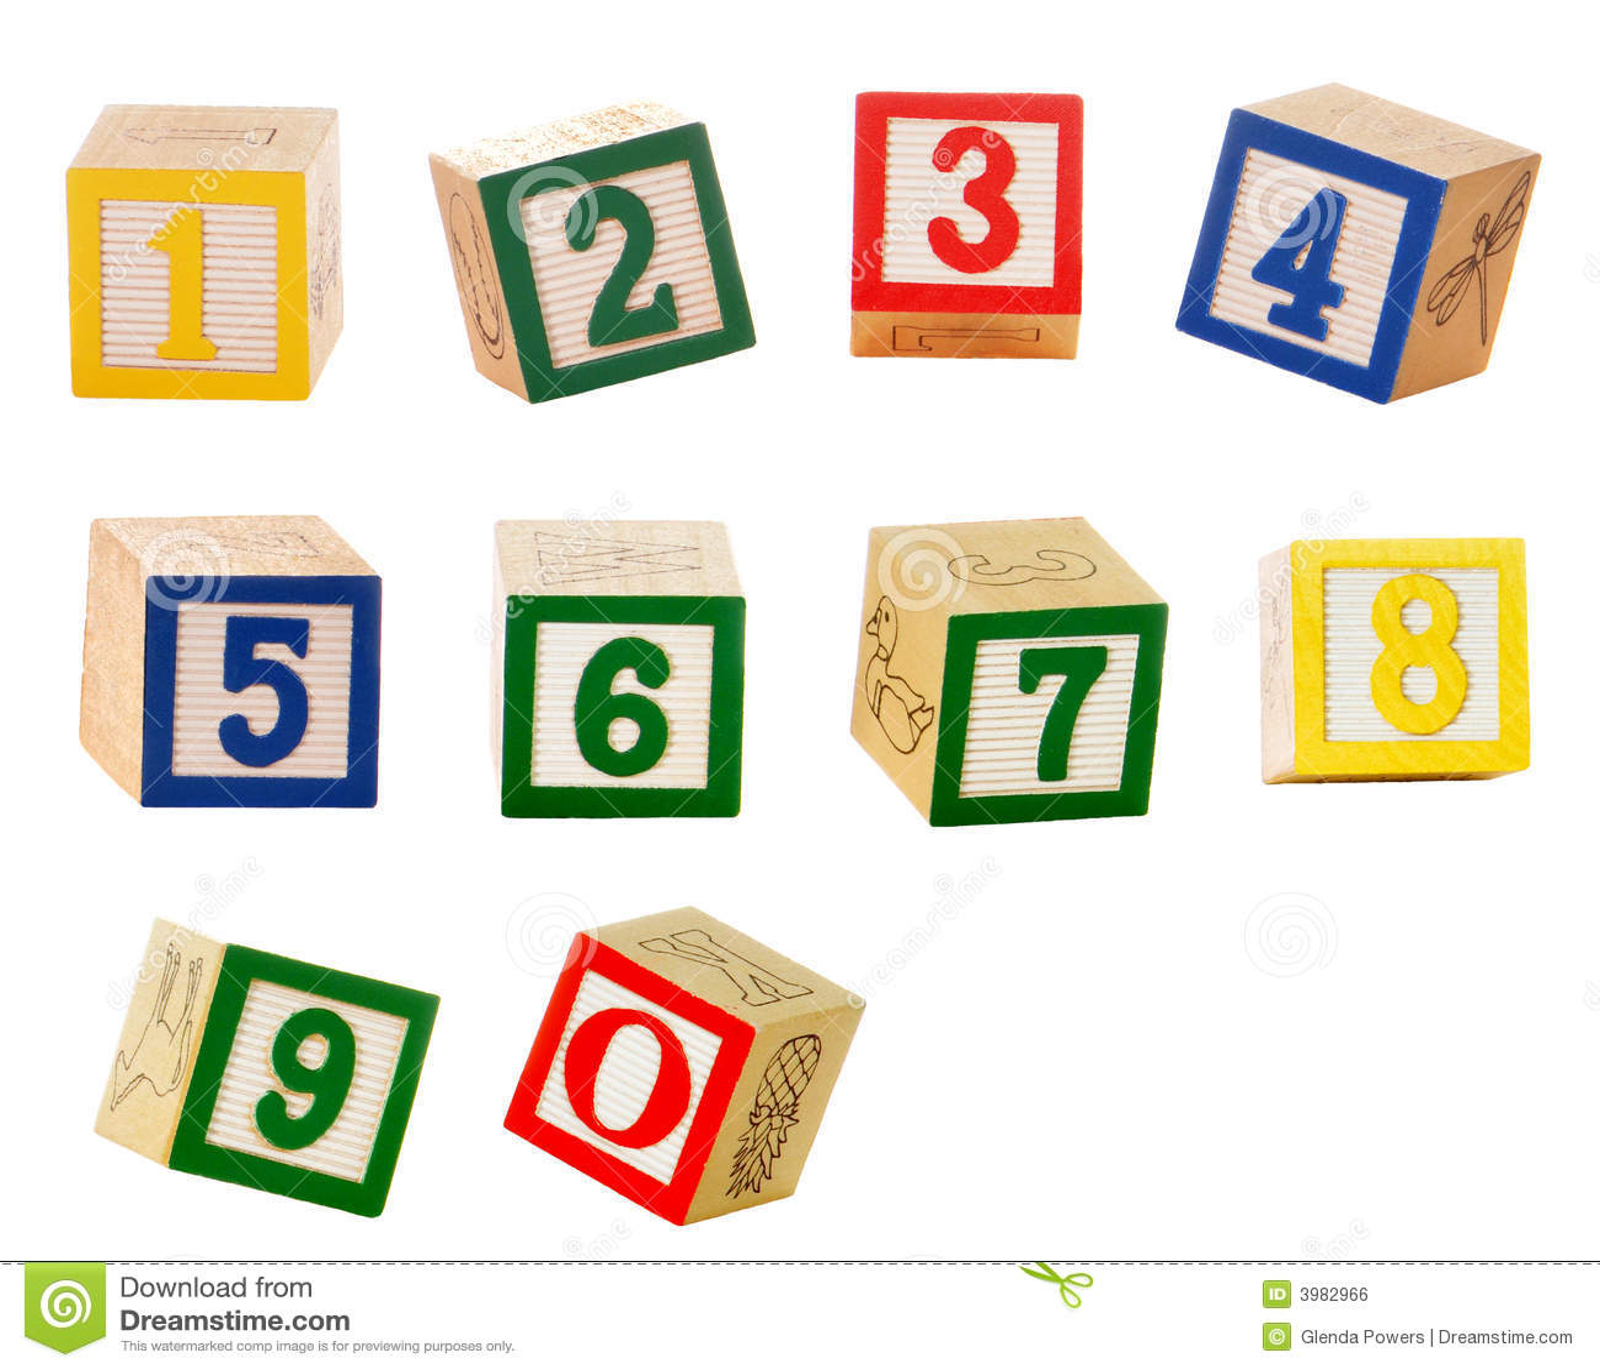 Number Blocks Royalty Free Stock Image - Image: 3982966